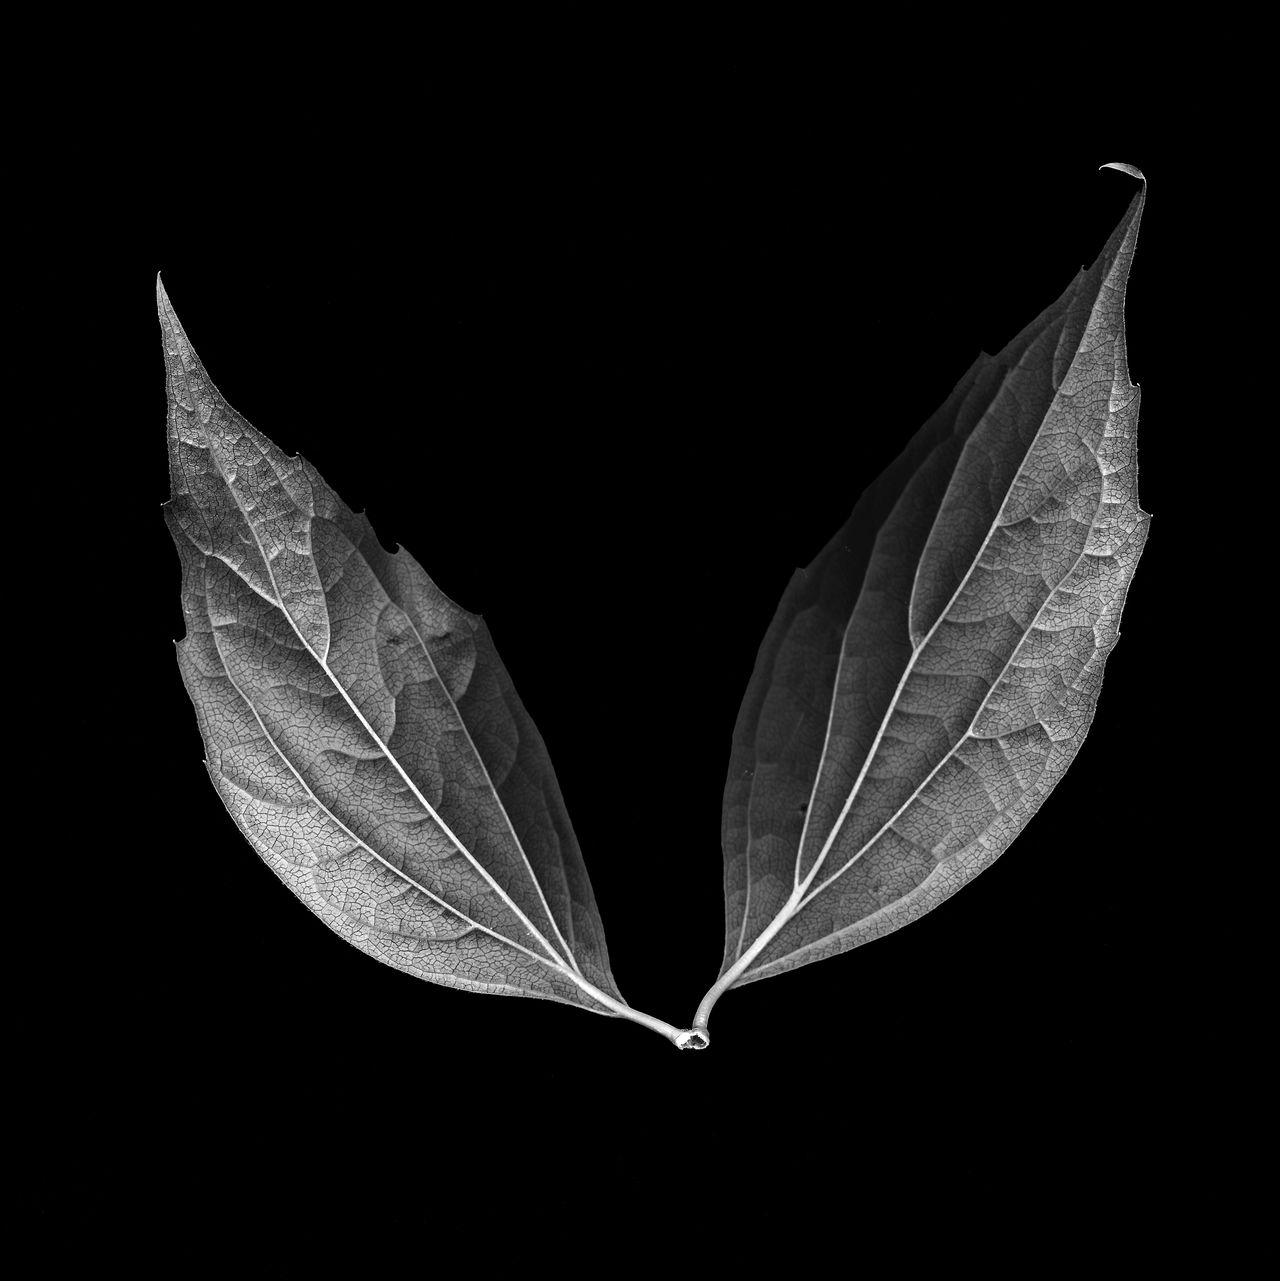 Black Black And White Black&white Blackandwhite Canoscan 9000f Leaf Scanner  White EyeEm Diversity Art Is Everywhere The Great Outdoors - 2017 EyeEm Awards BYOPaper!